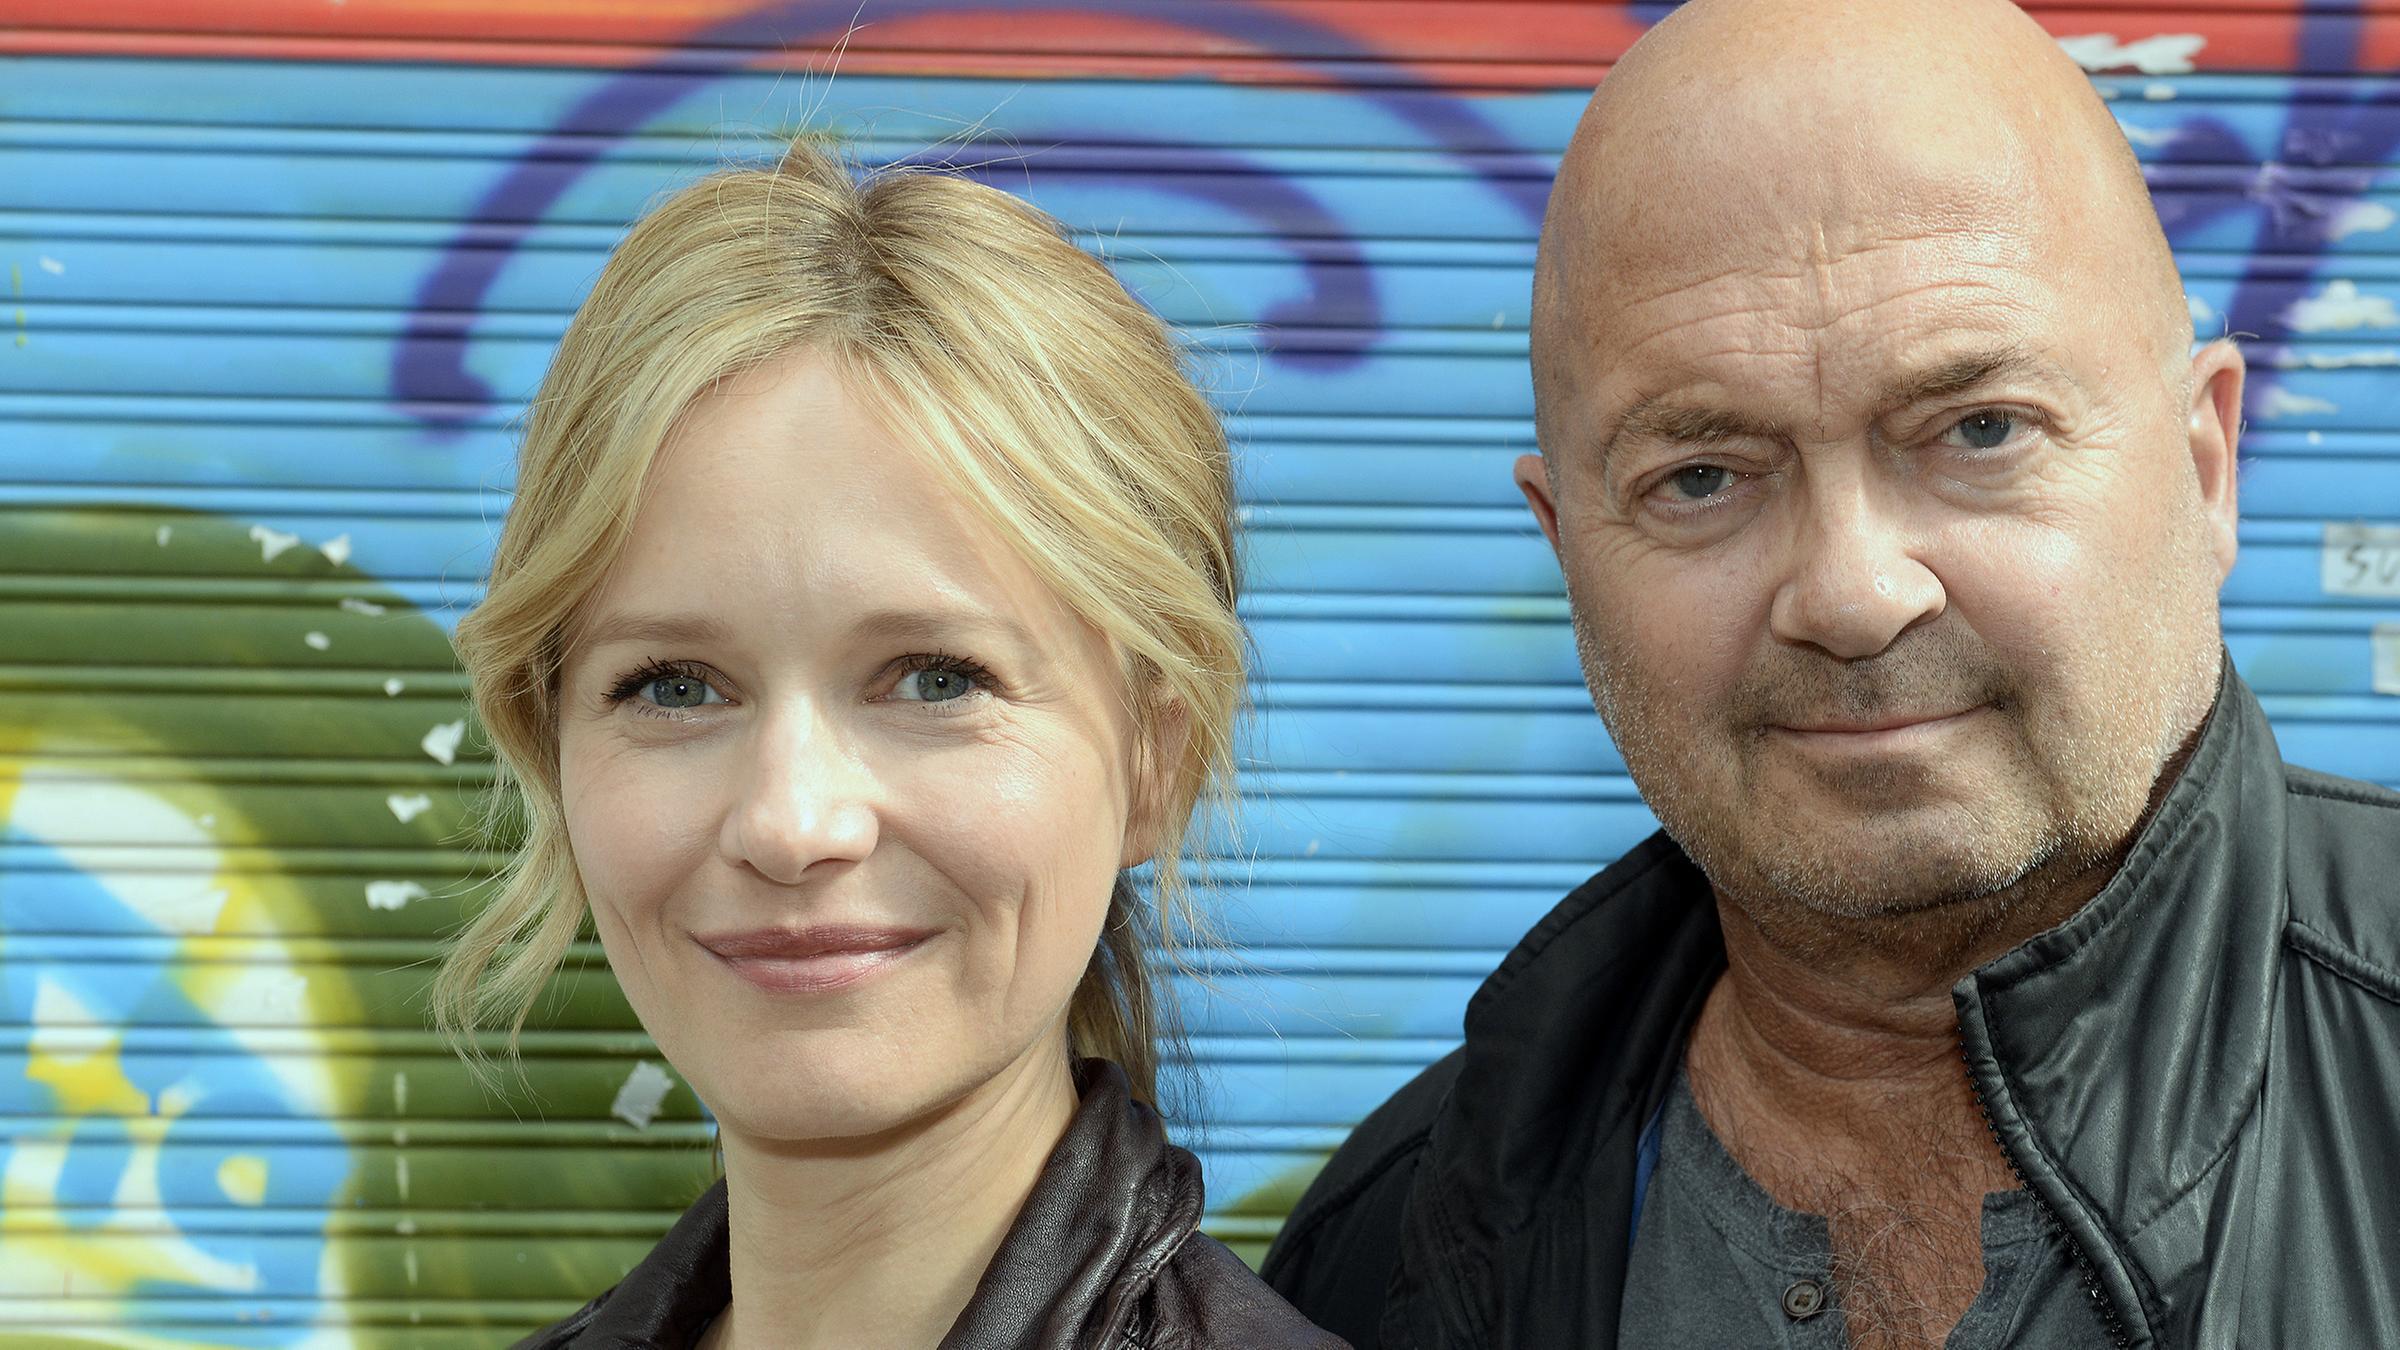 Ein Starkes Team Spannende Krimis Aus Berlin Zdfmediathek